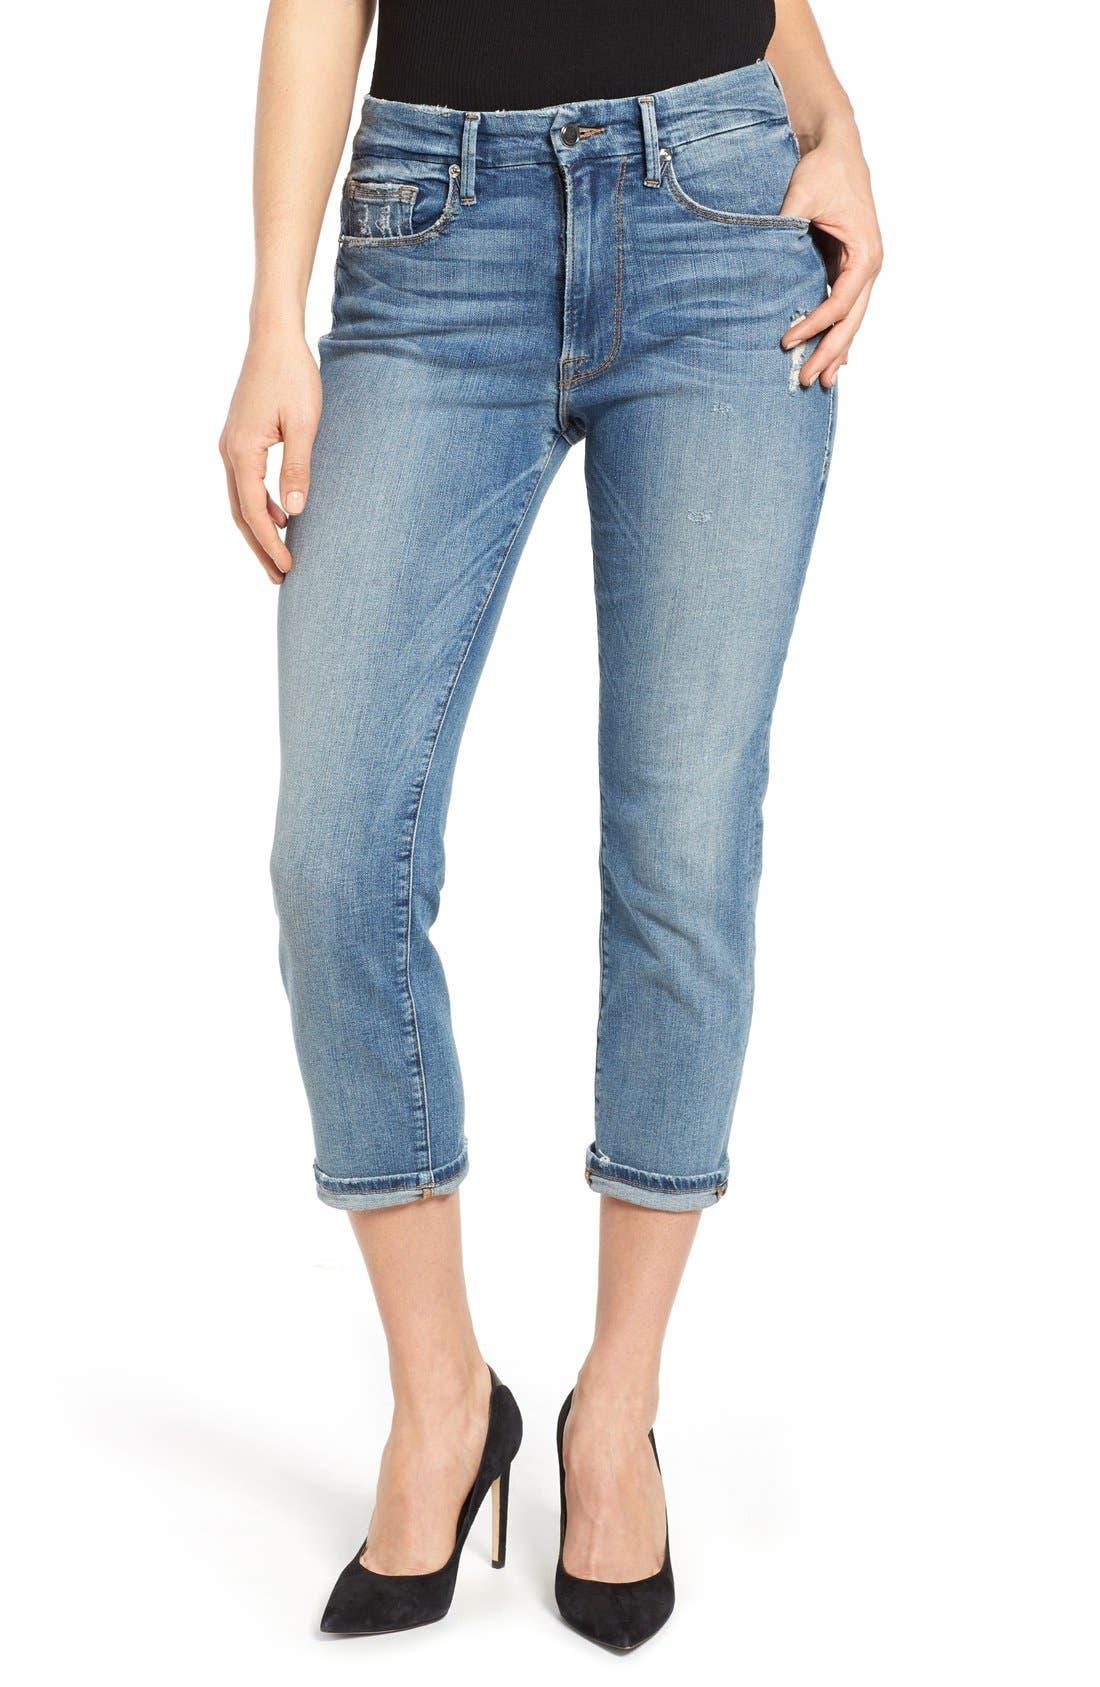 Alternate Image 1 Selected - Good American Good Cuts High Rise Boyfriend Jeans